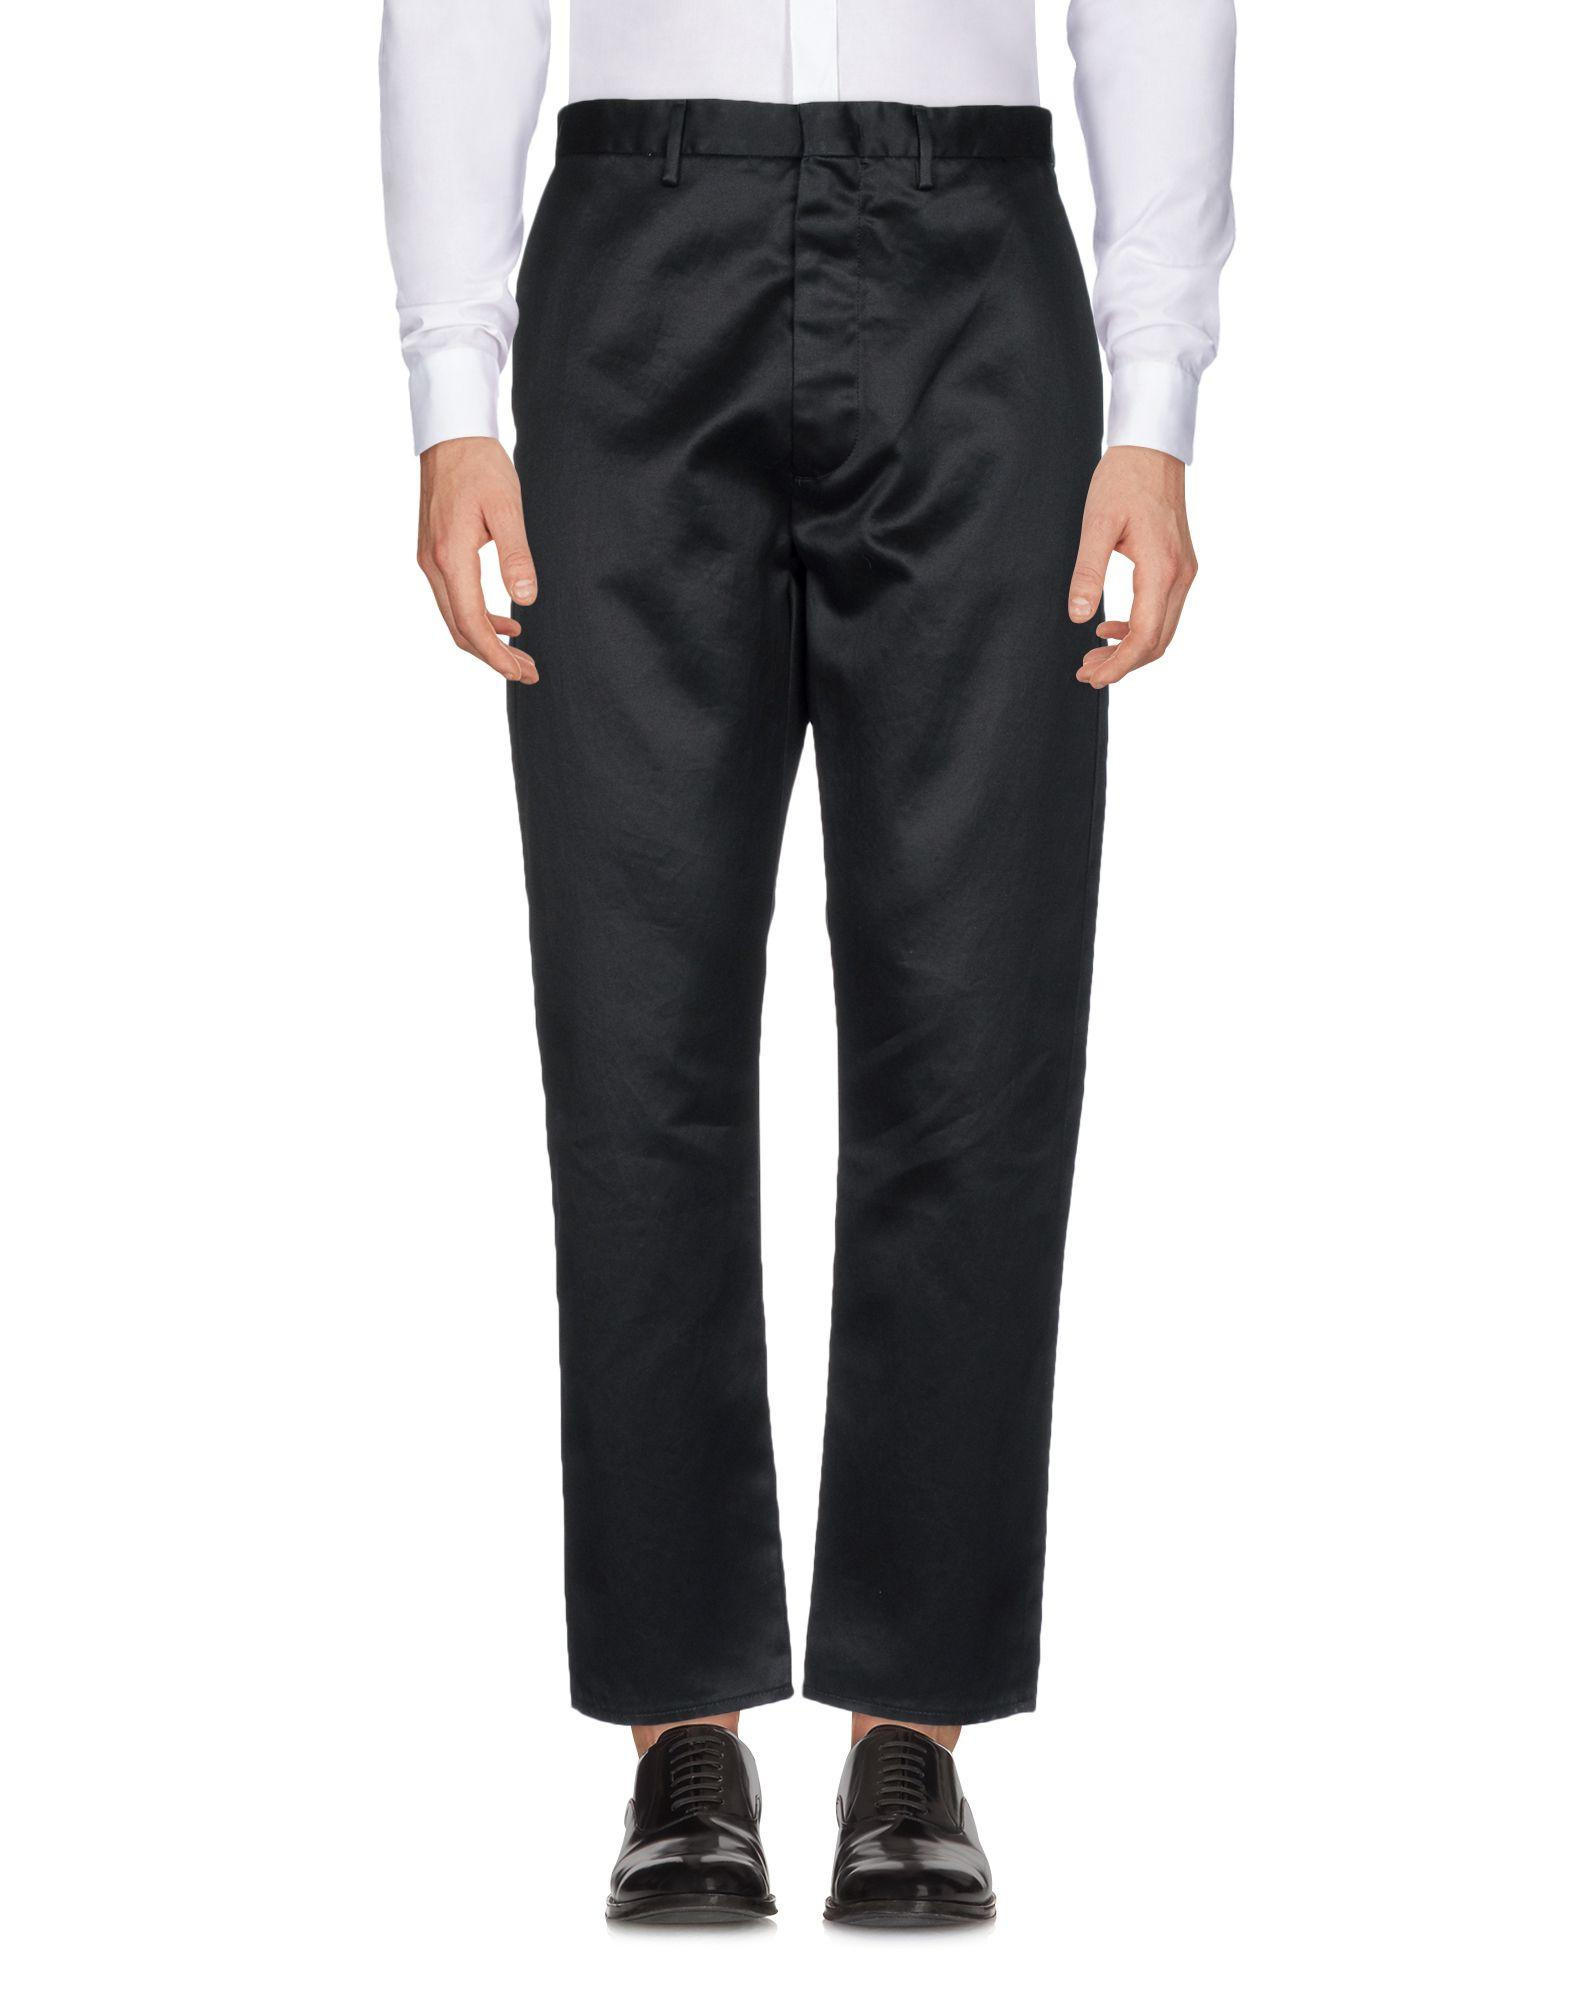 Pantalone Pence Uomo - Acquista online su